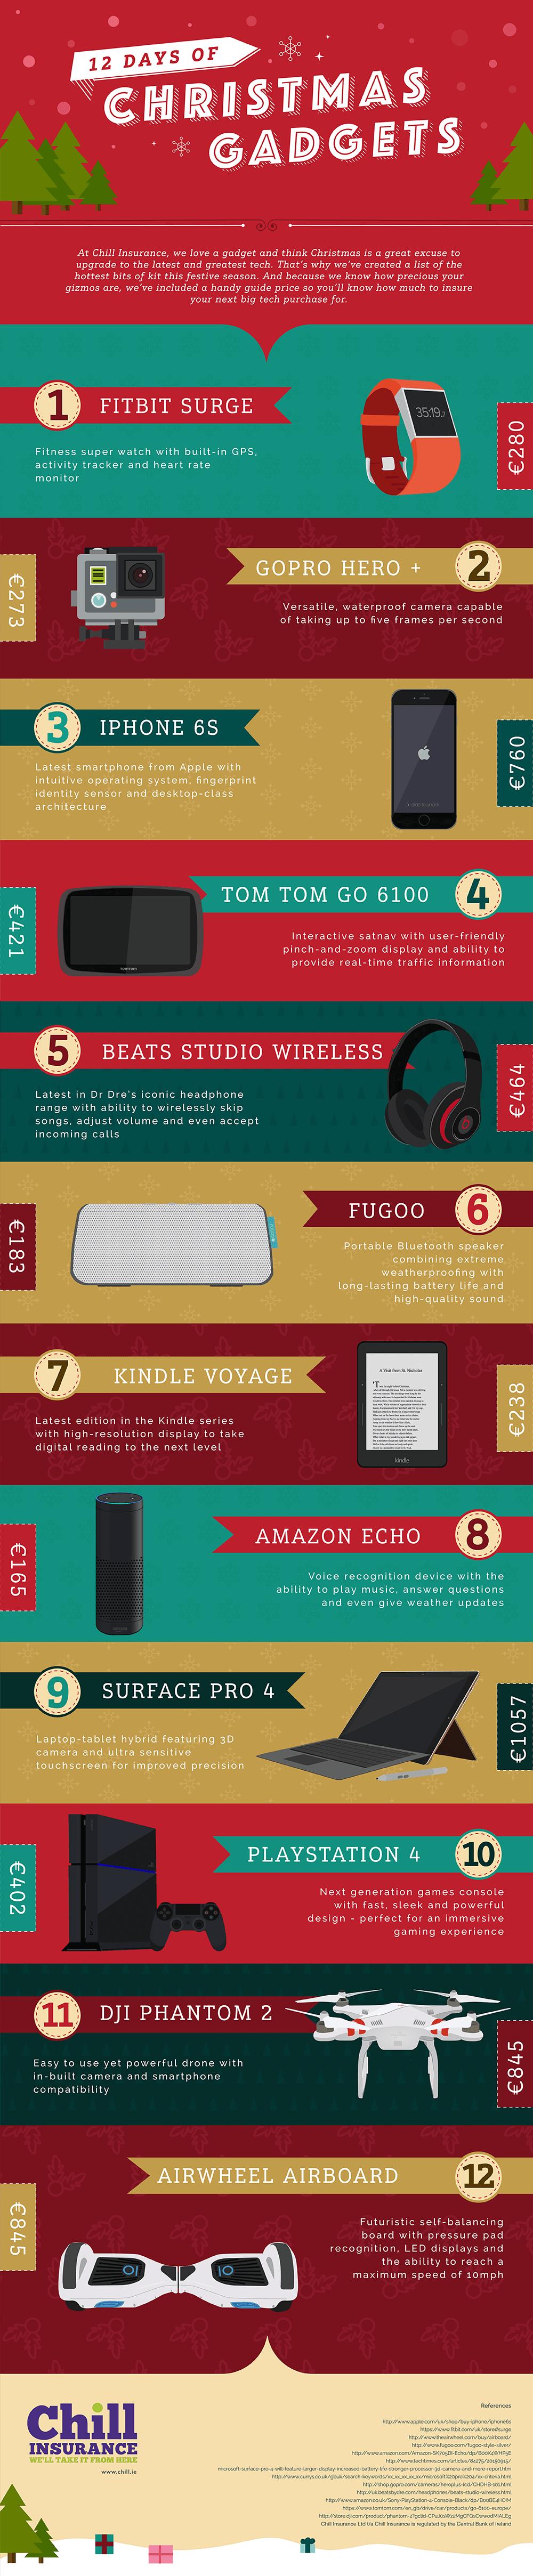 Christmas Gadgets 2015